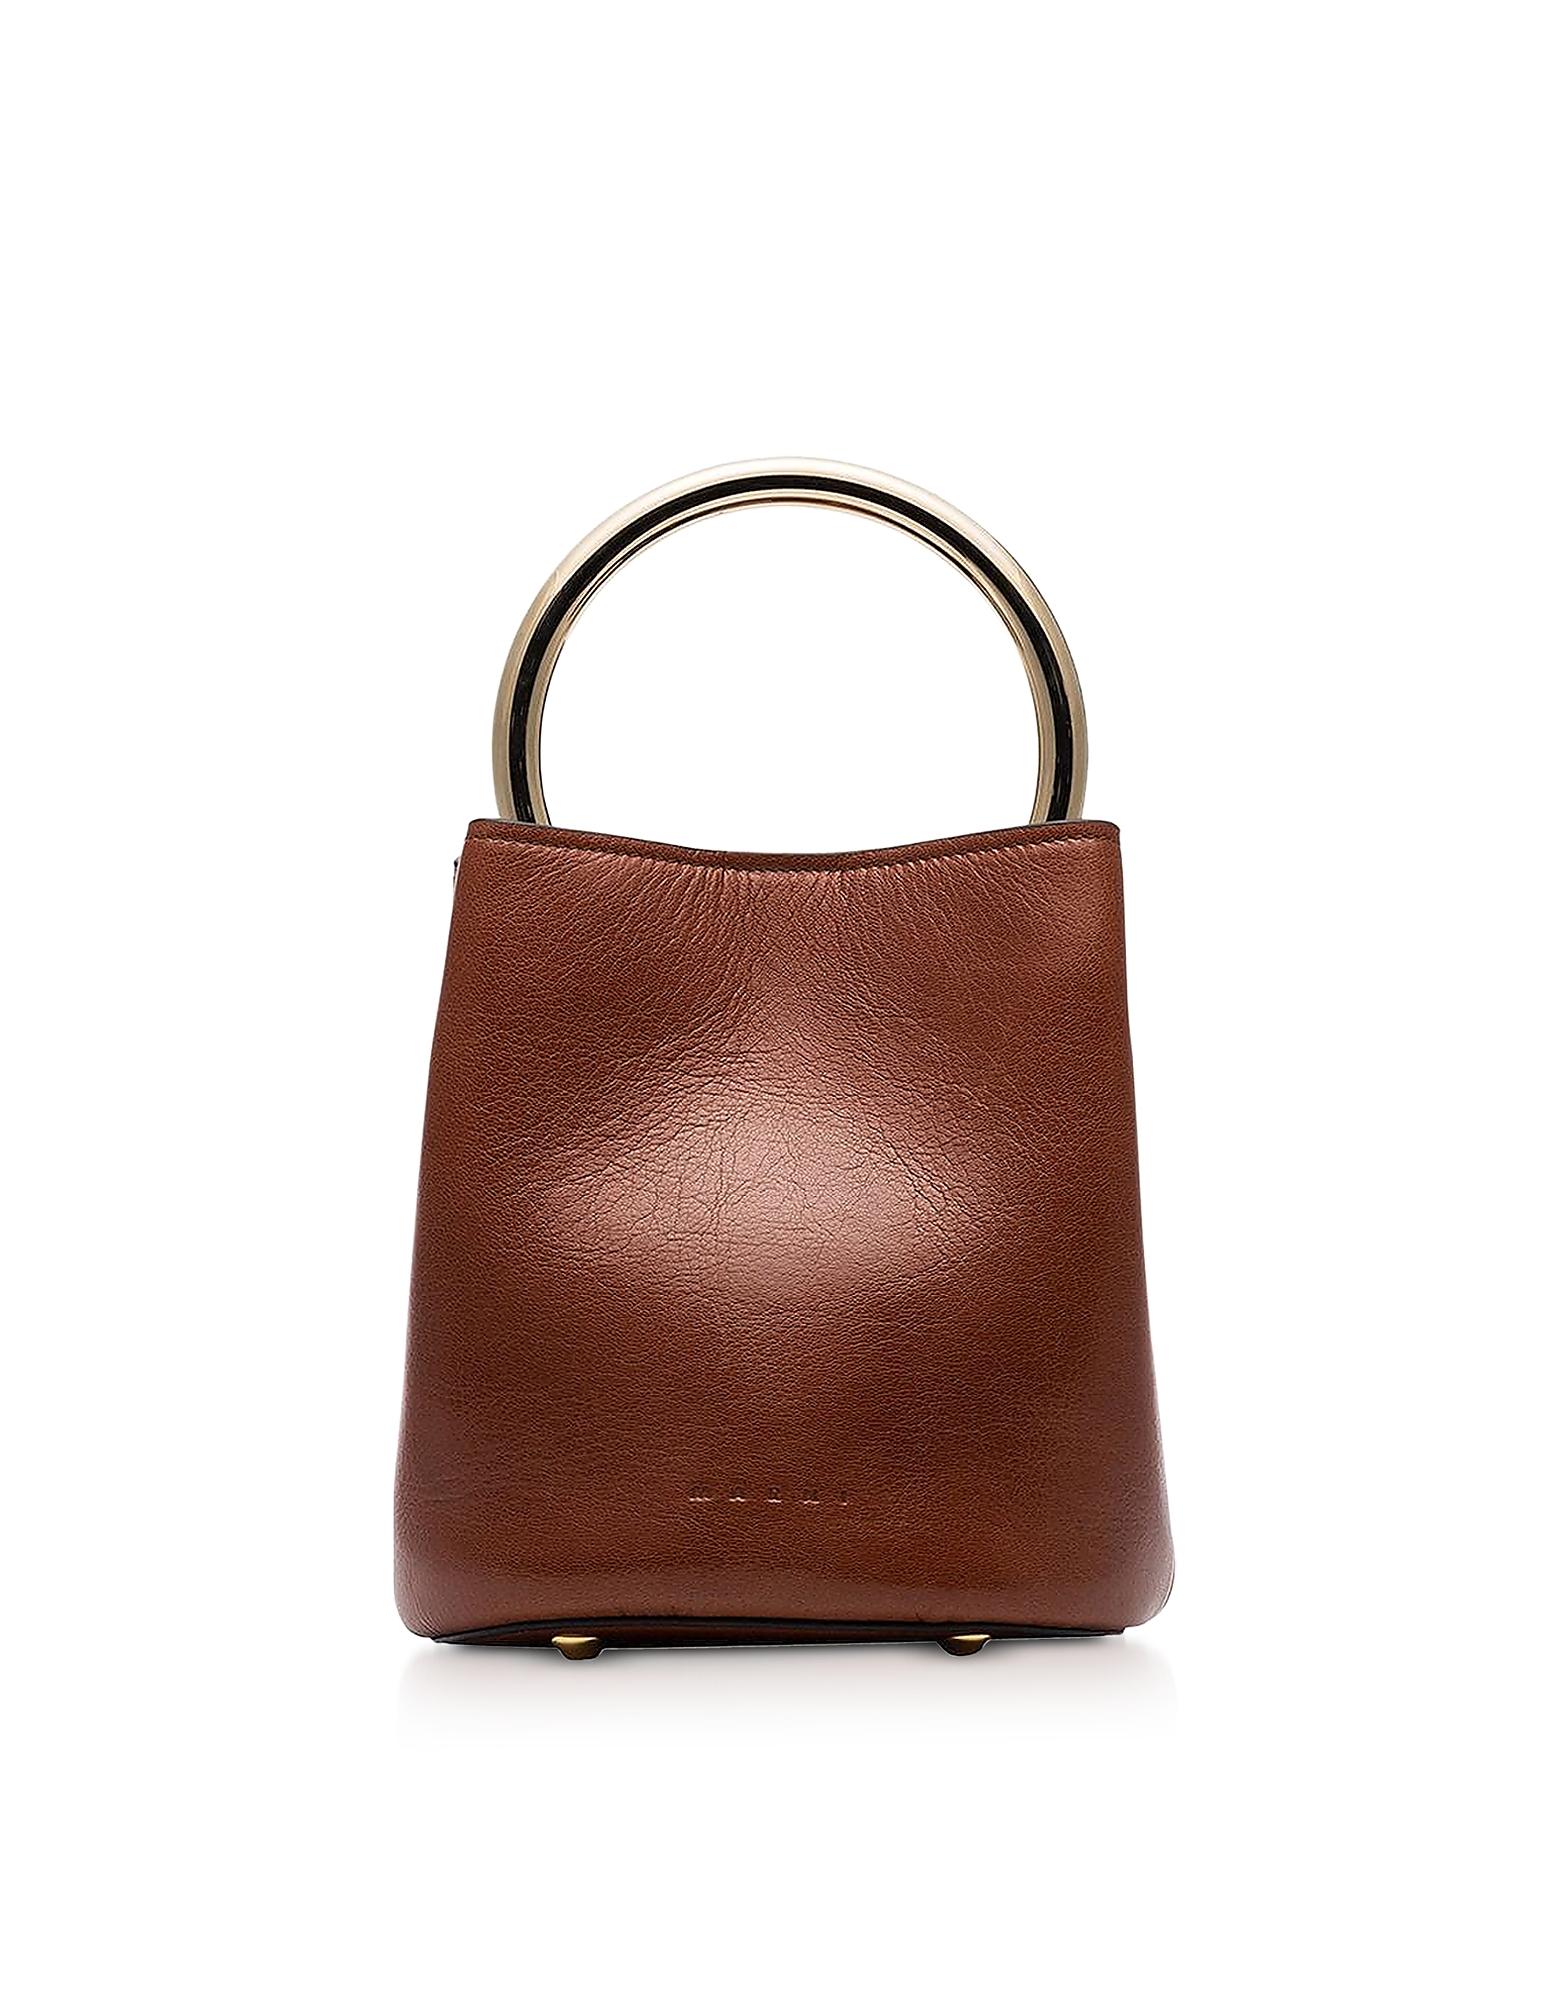 Pannier Top Handle Bag